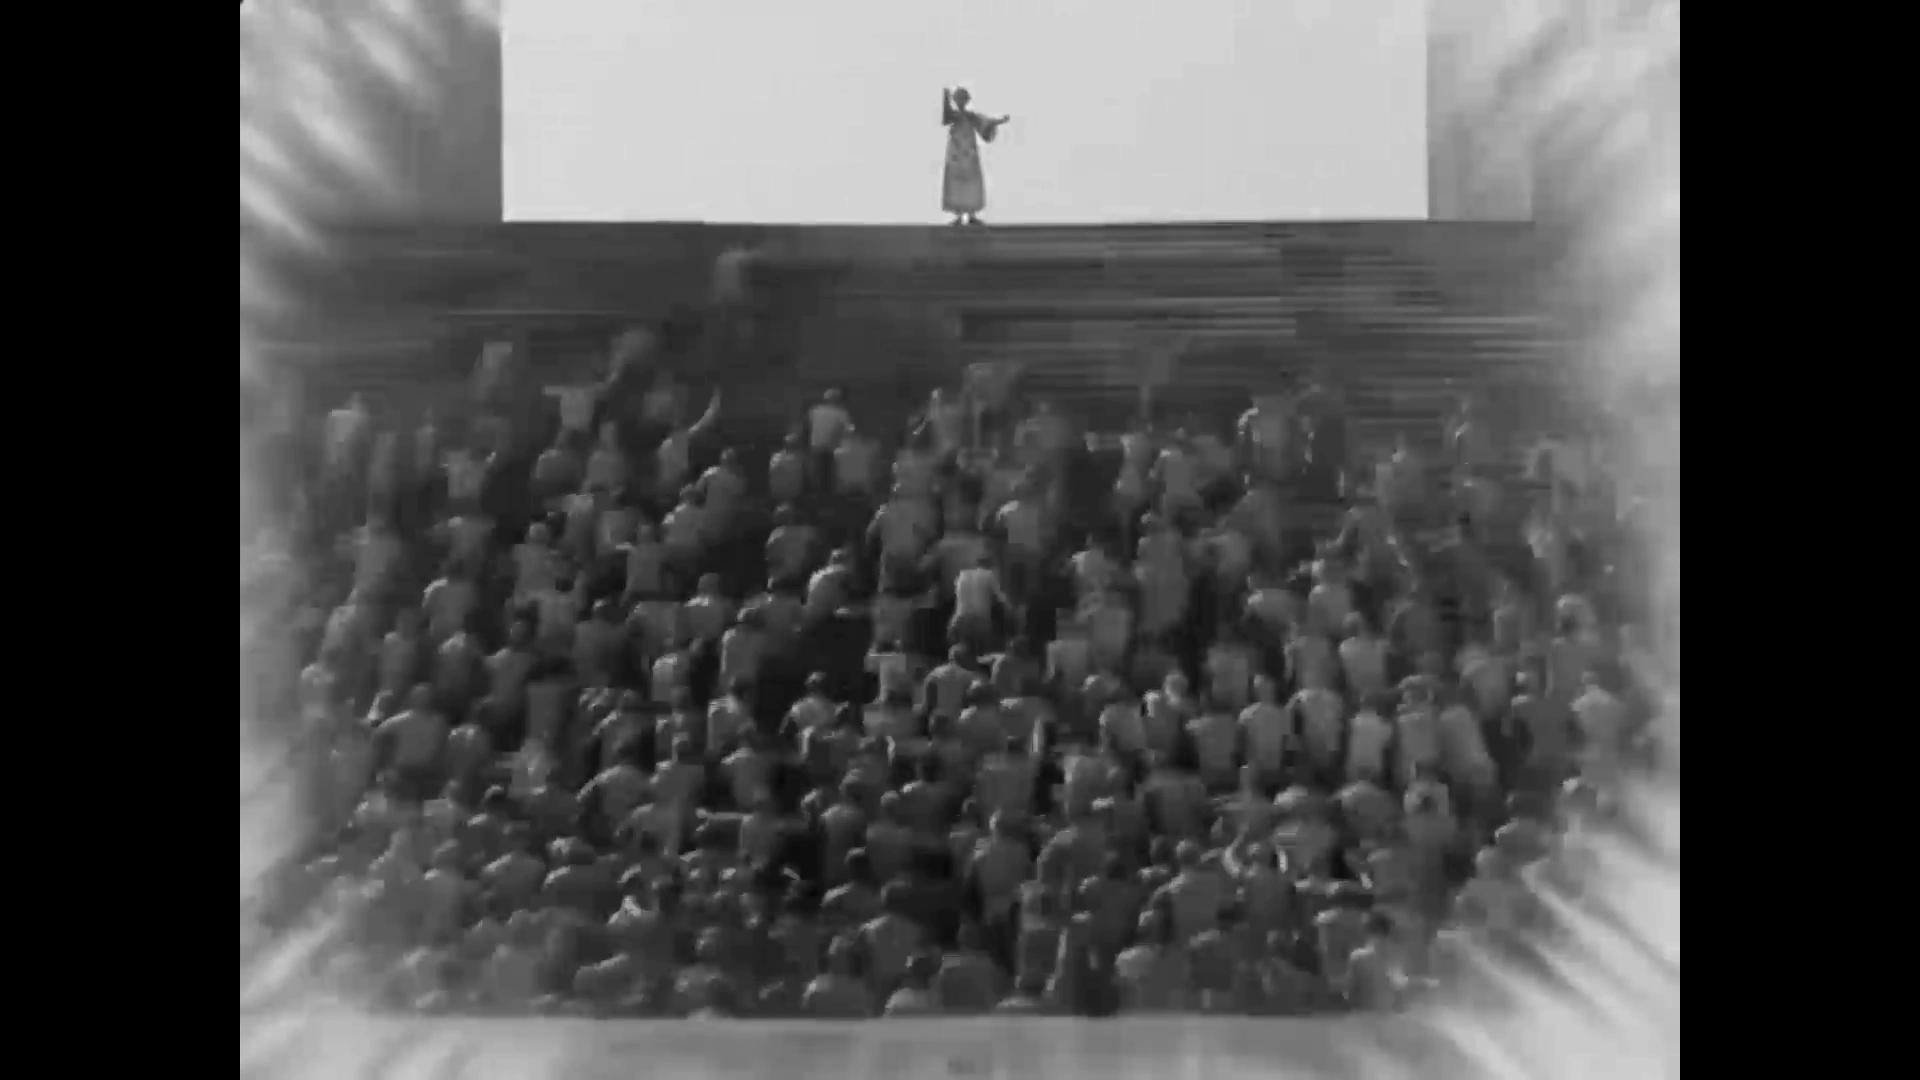 Horacy Muszyński, Chaos bygame, kadr zfilmu